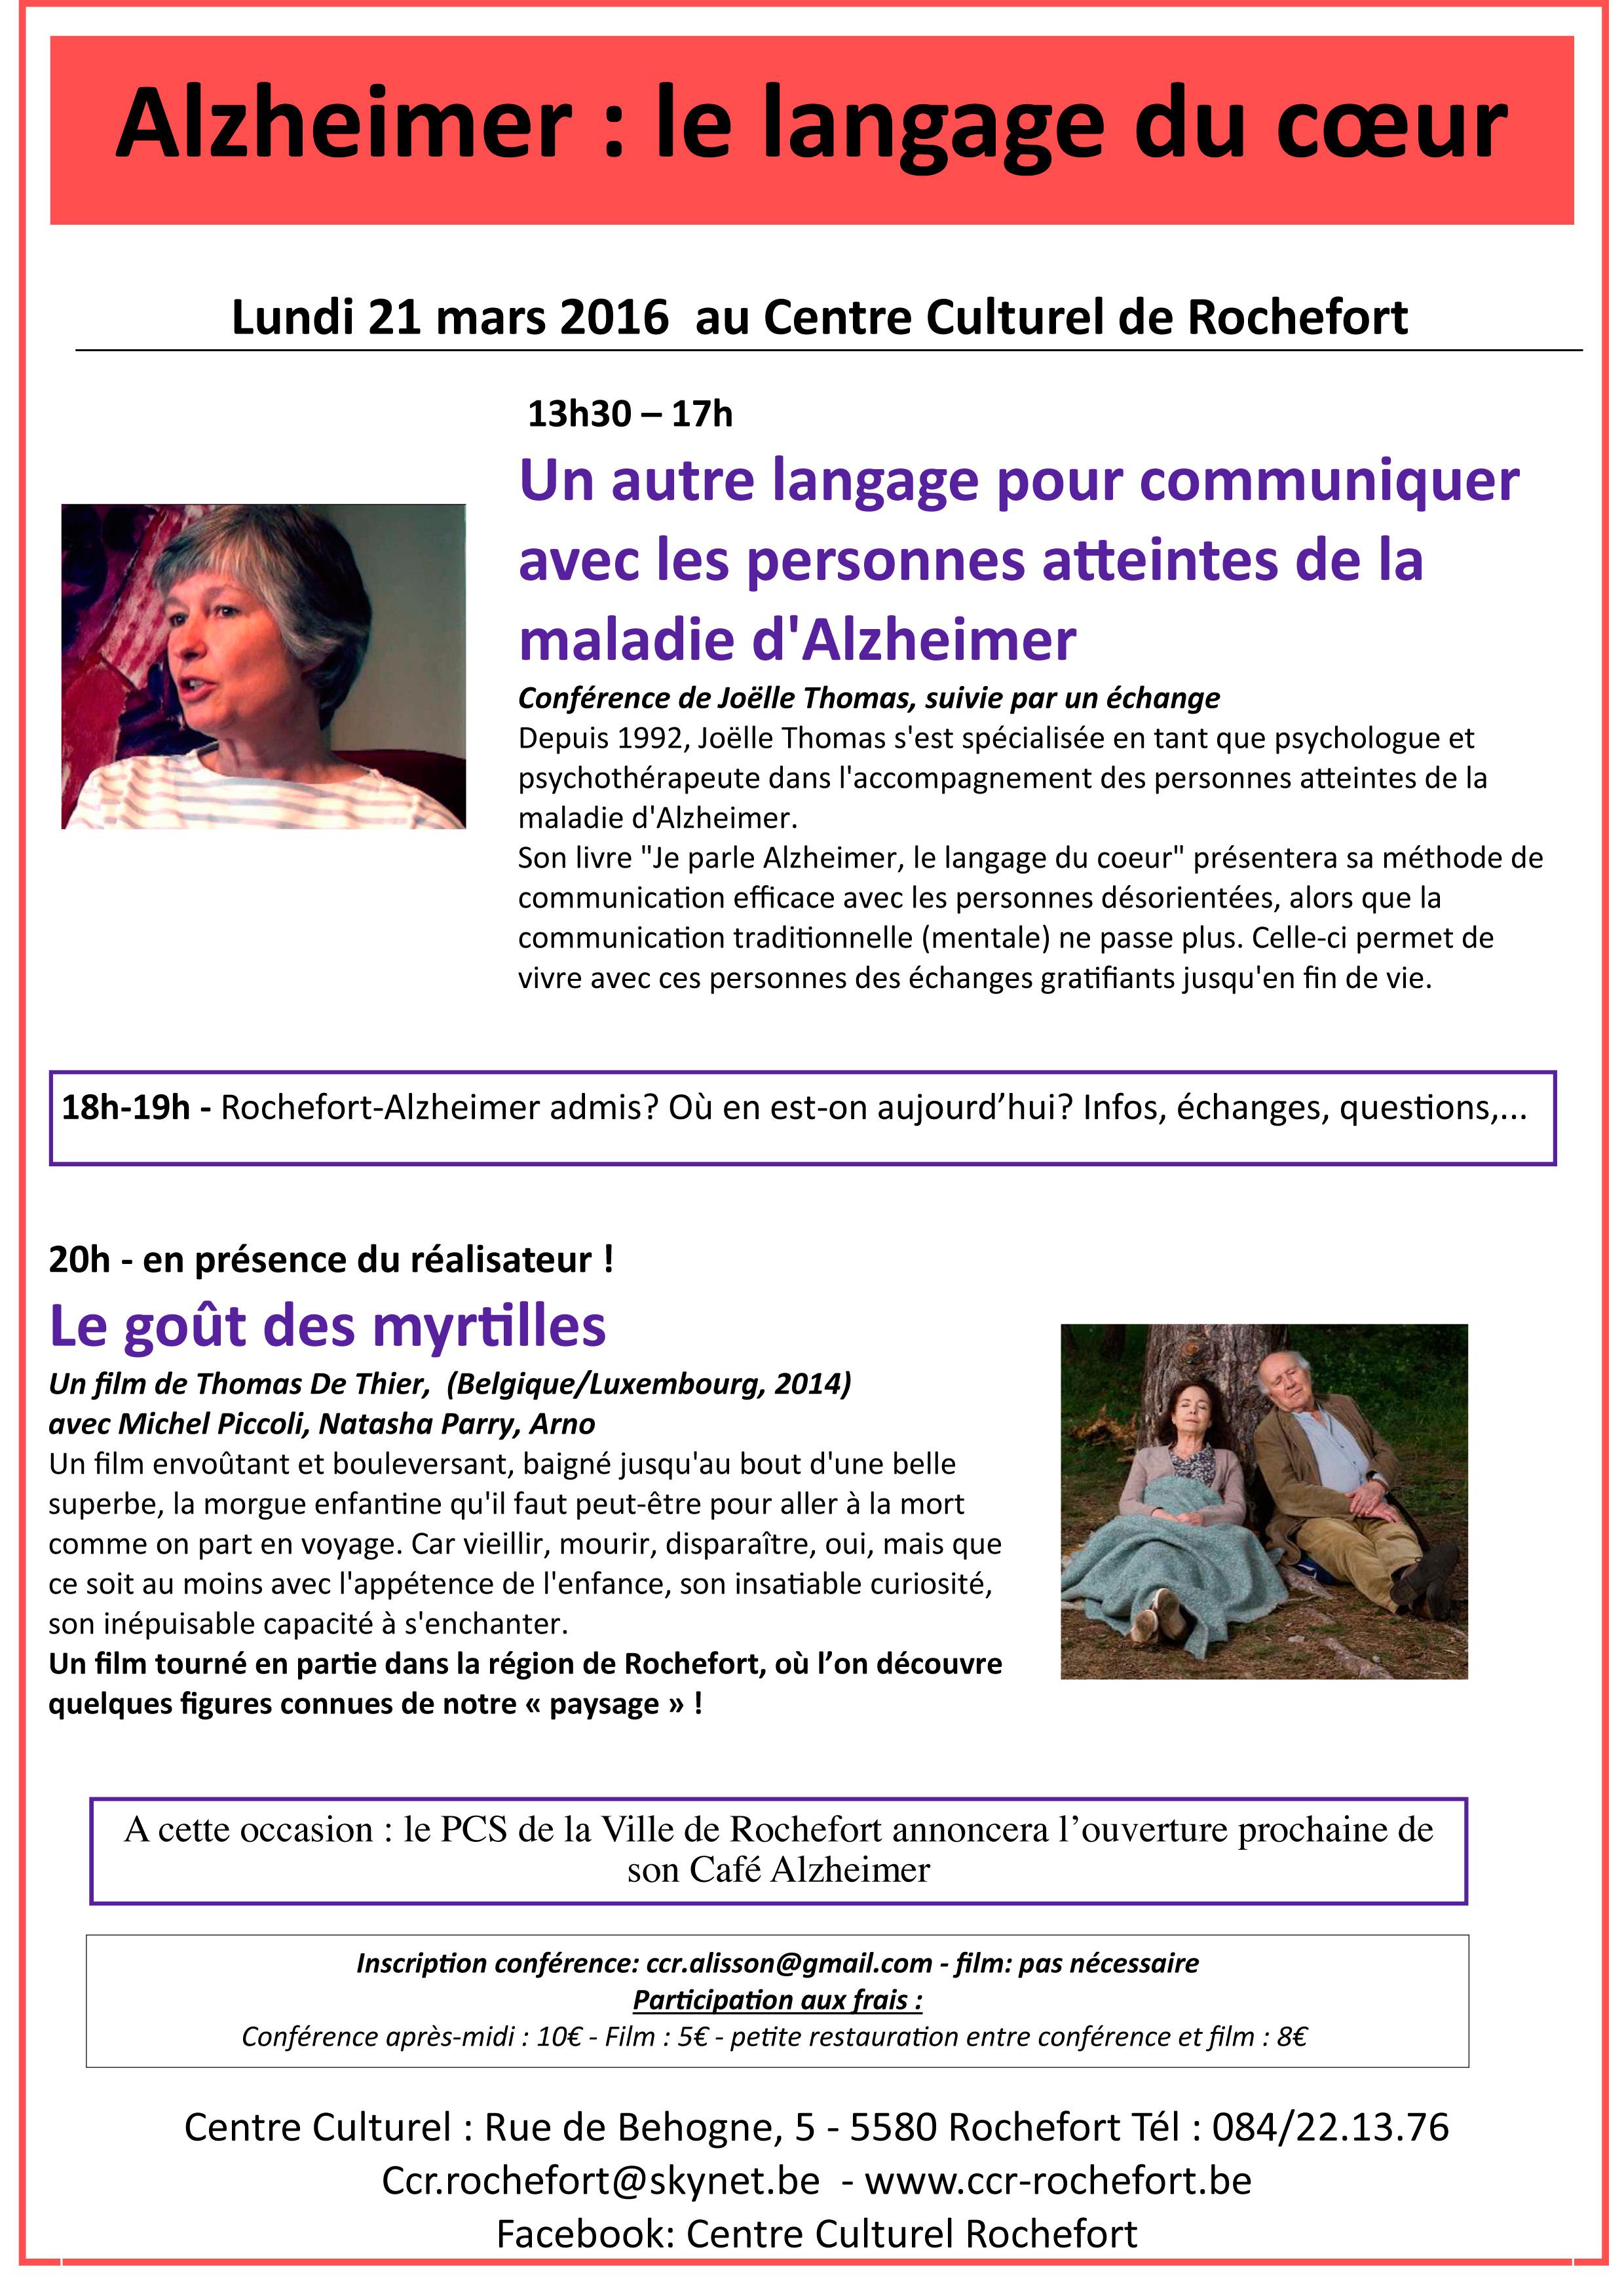 Alzheimer_le_langage_du-coeur